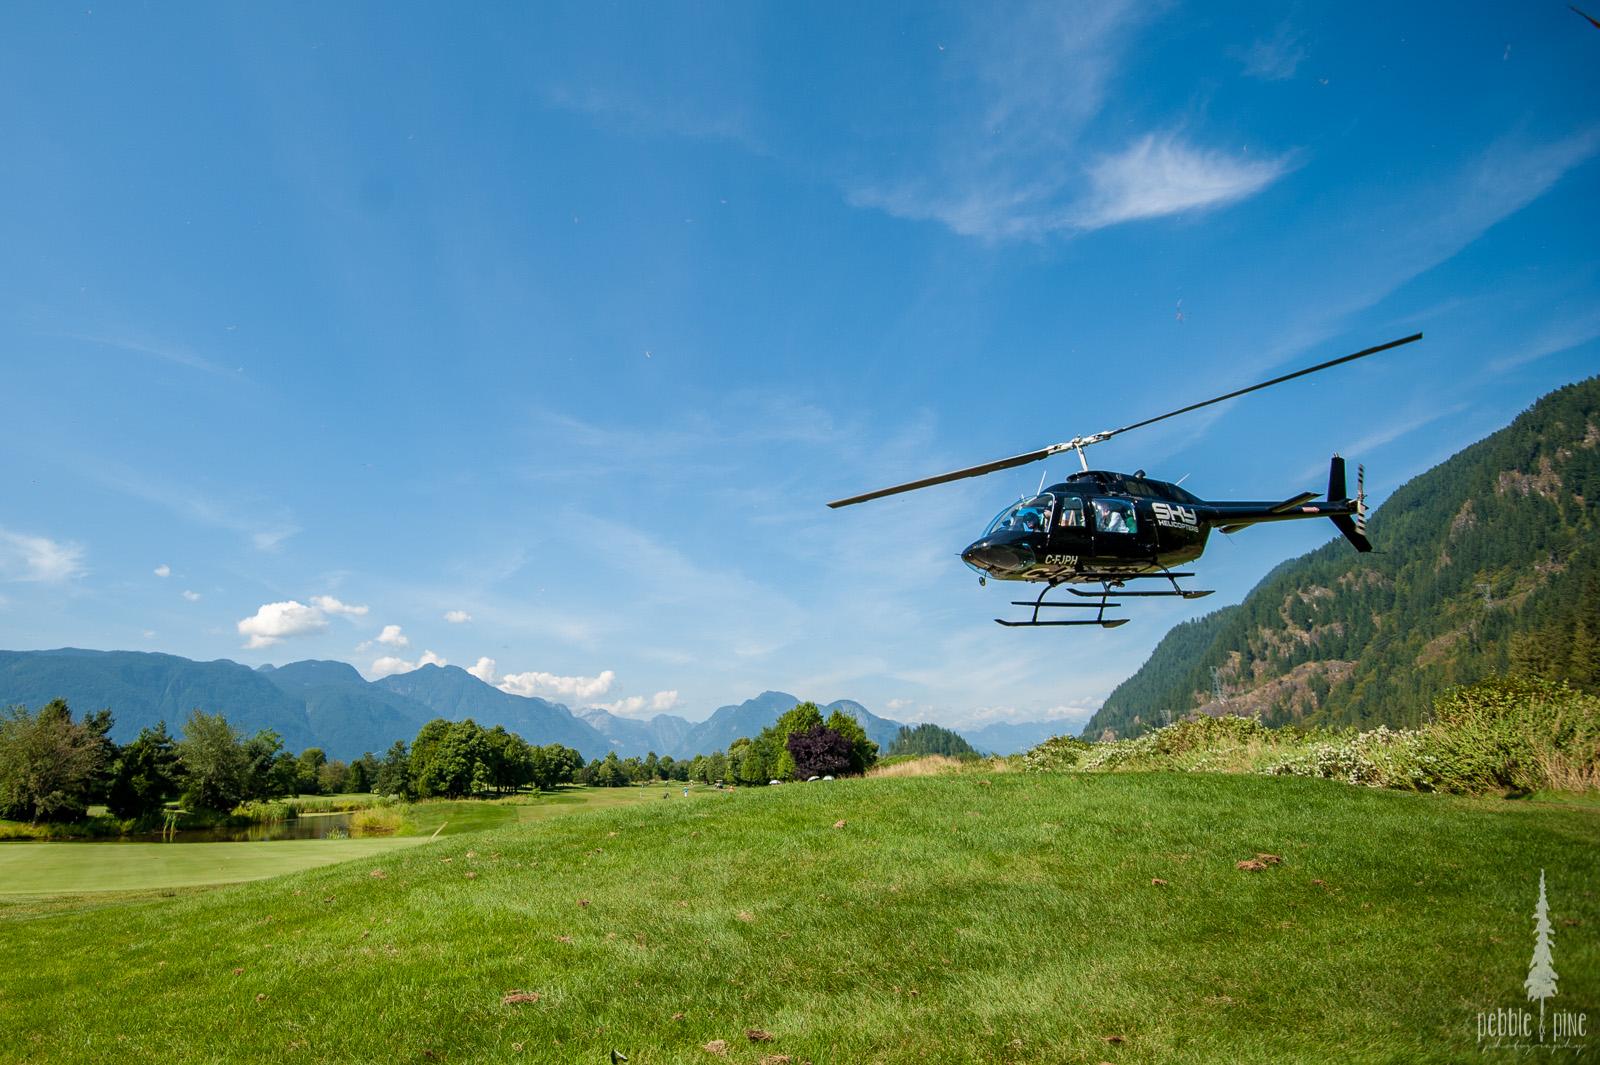 vancouver-island-wedding-photographers-golden-eagle-golf-course-wedding-mountaintop-wedding-27.jpg